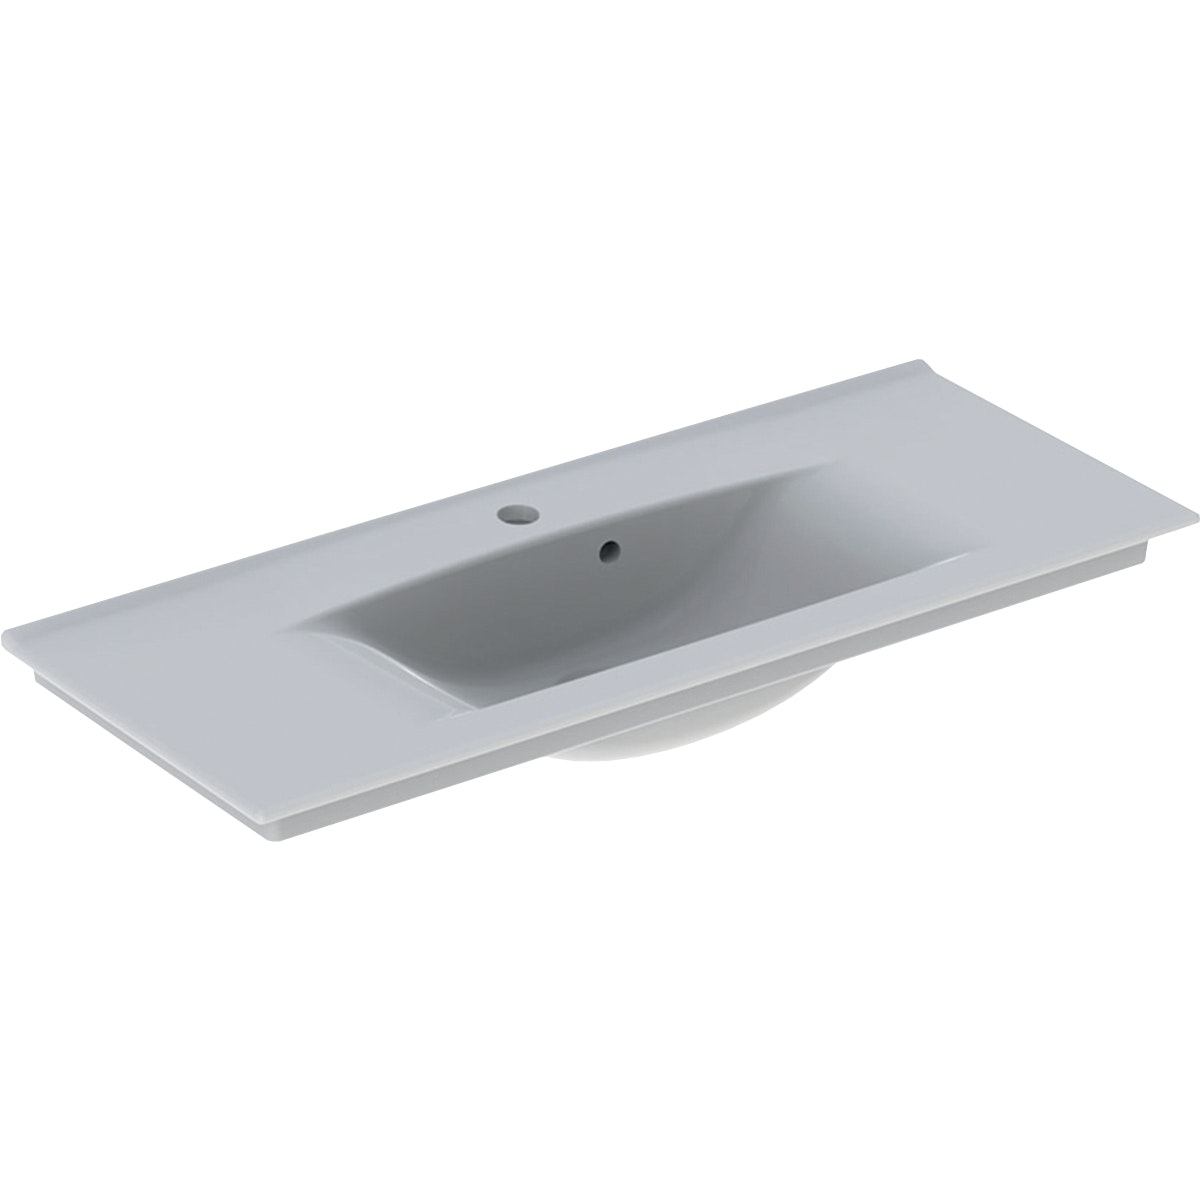 Möbeltvättställ Ido Elegant Compact 90cm Vit